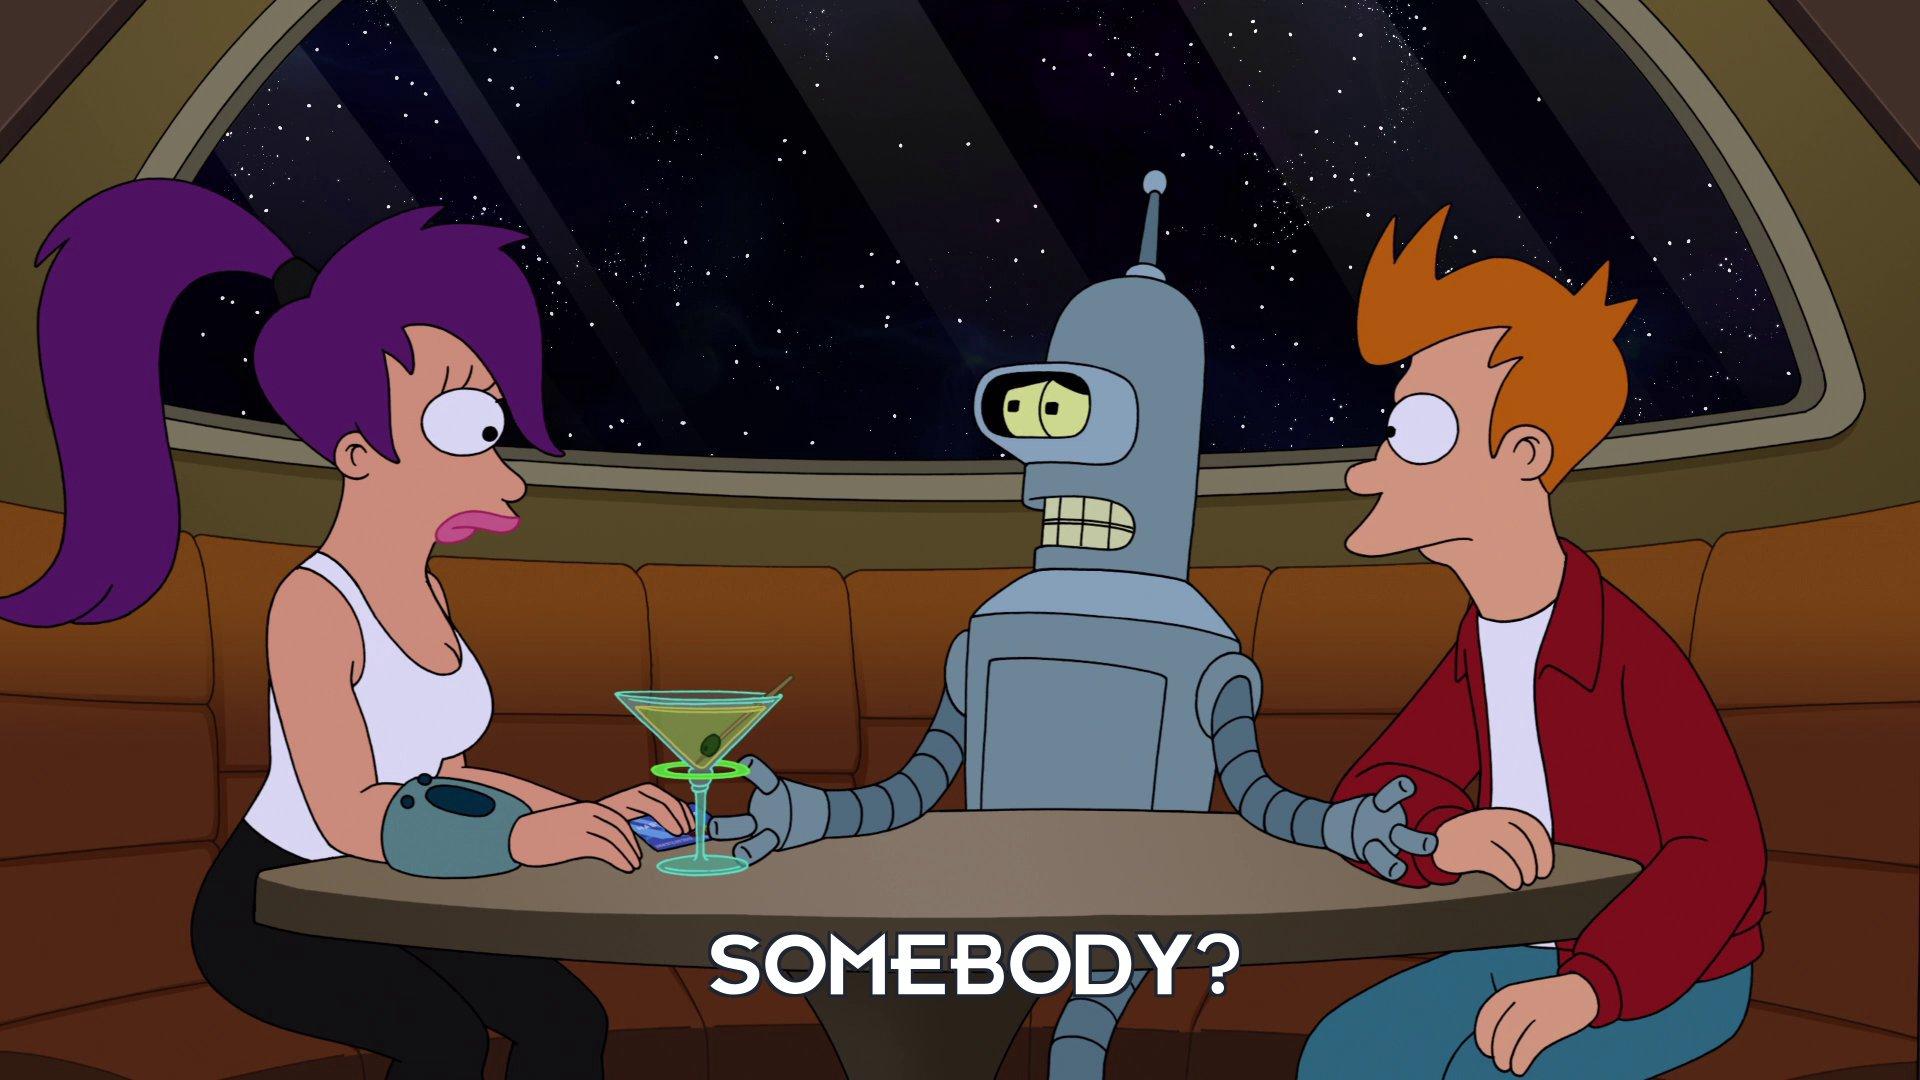 Bender Bending Rodriguez: Somebody?